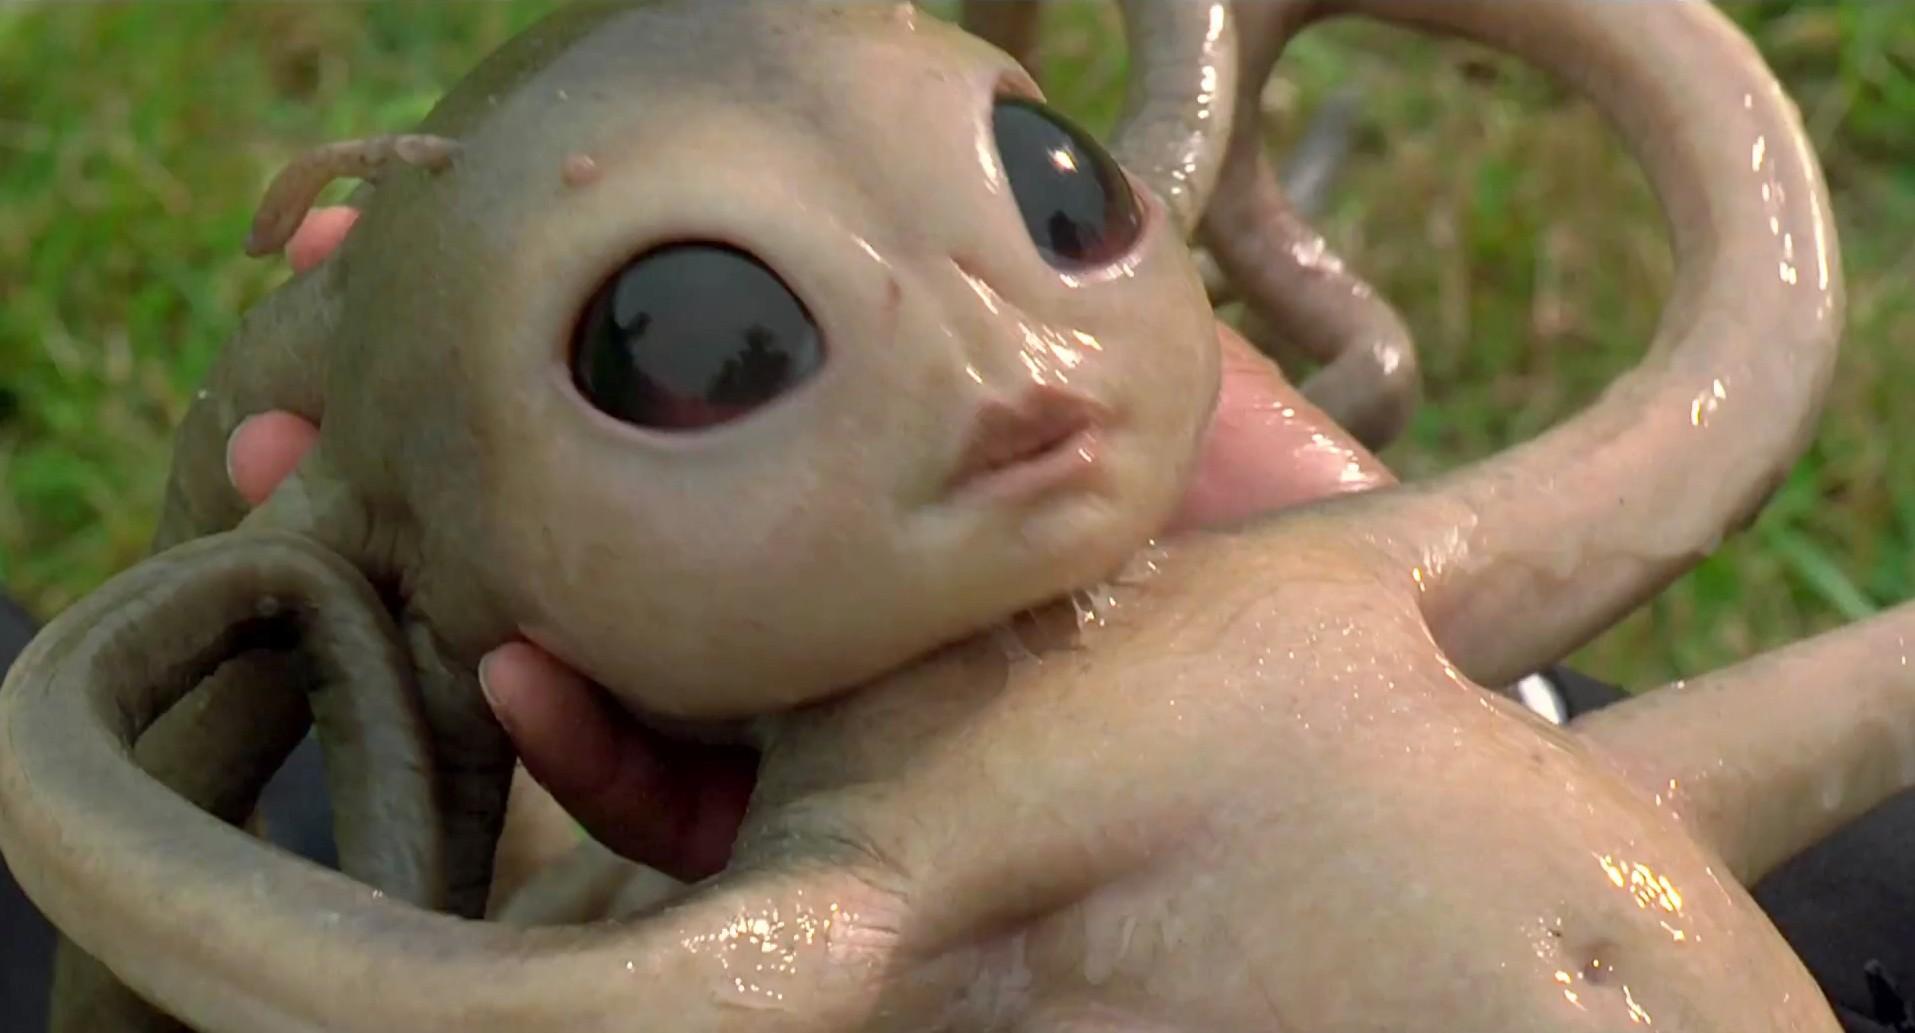 alien-baby-from-men-in-black-1997.jpg